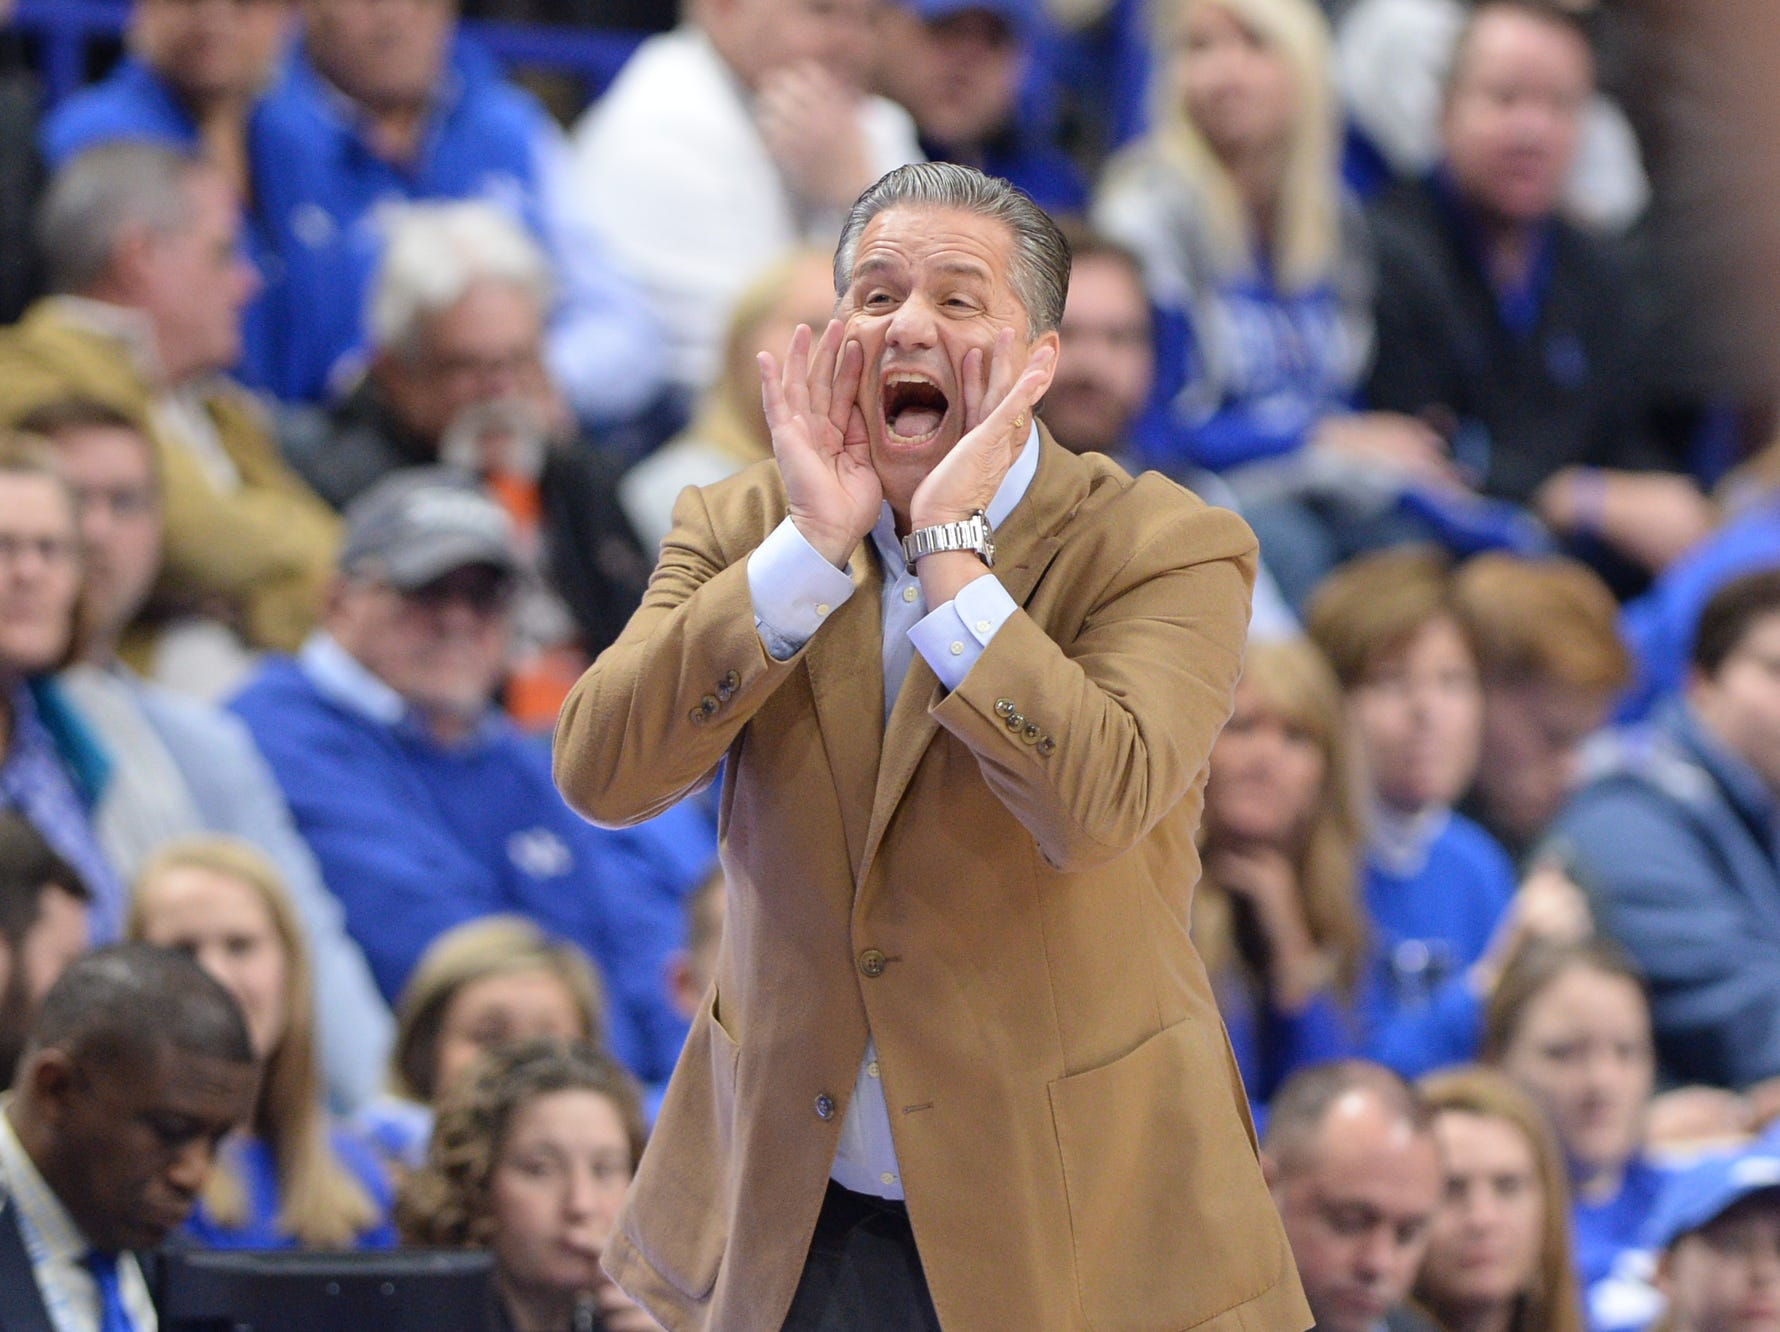 UK head coach John Calipari during the University of Kentucky mens basketball game against Monmouth at Rupp Arena in Lexington, Kentucky on Wednesday, November 28, 2018.